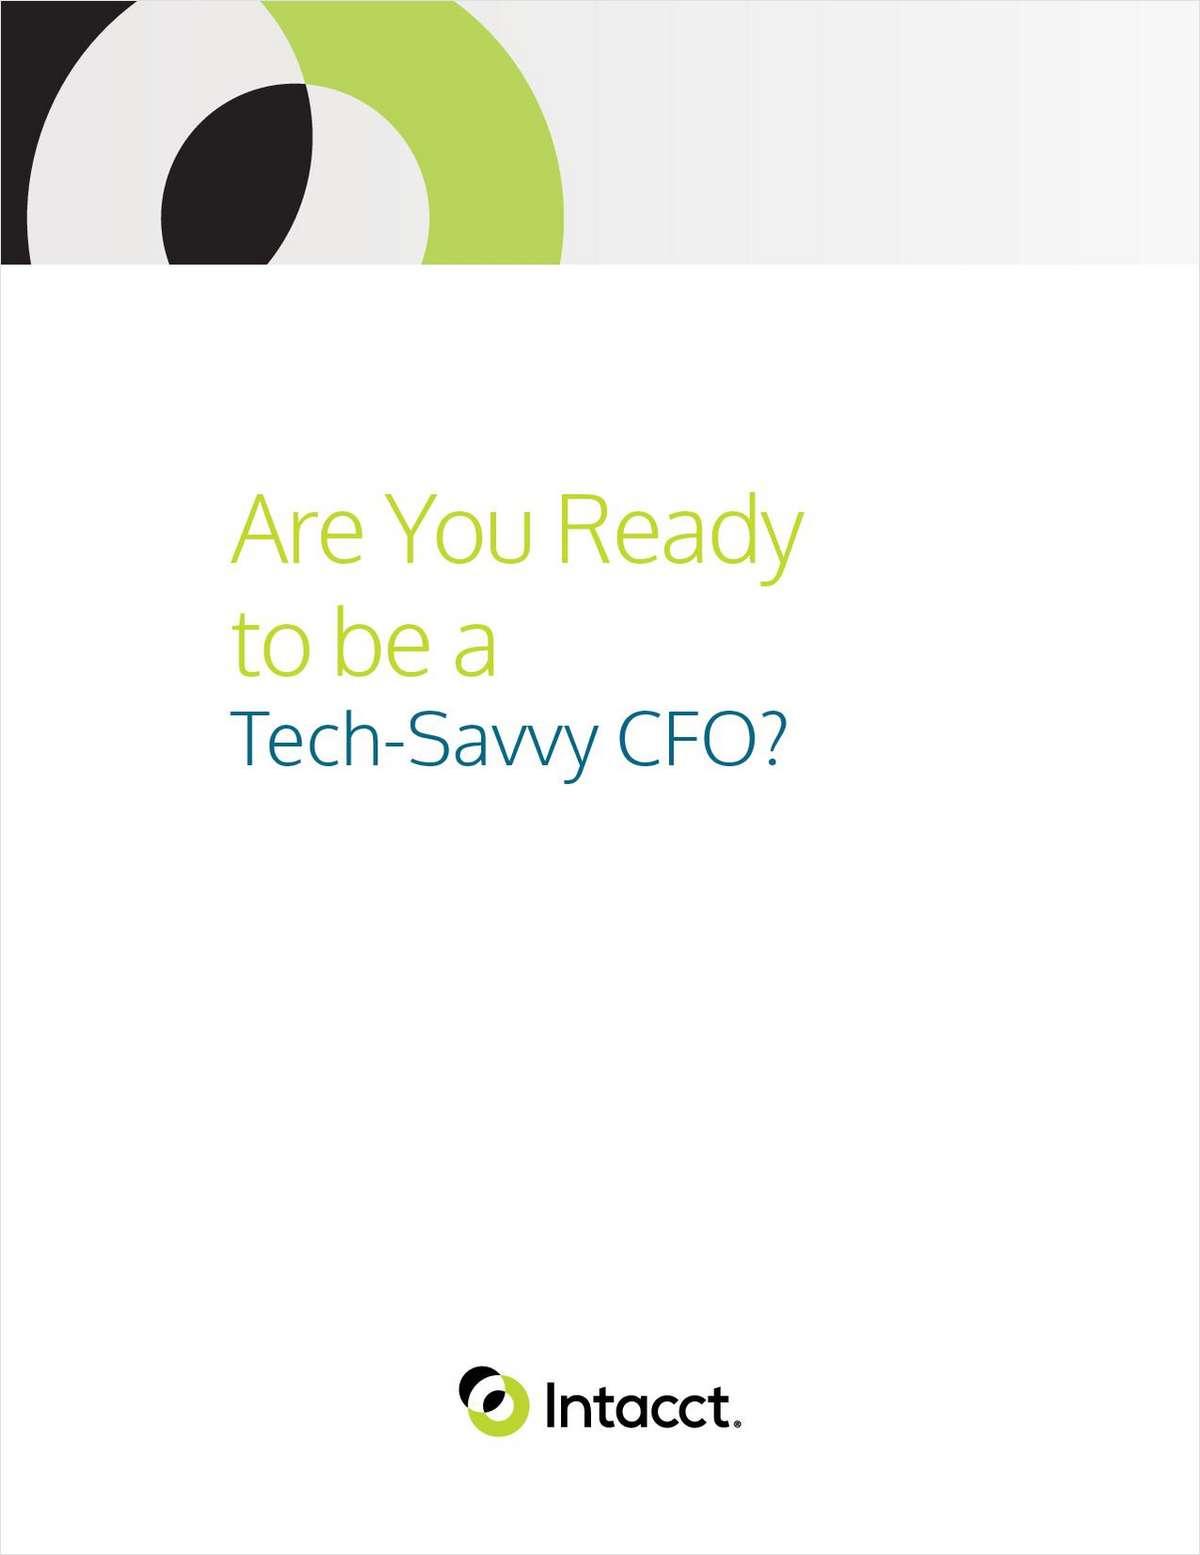 Are You Ready to Be a Tech Savvy CFO?